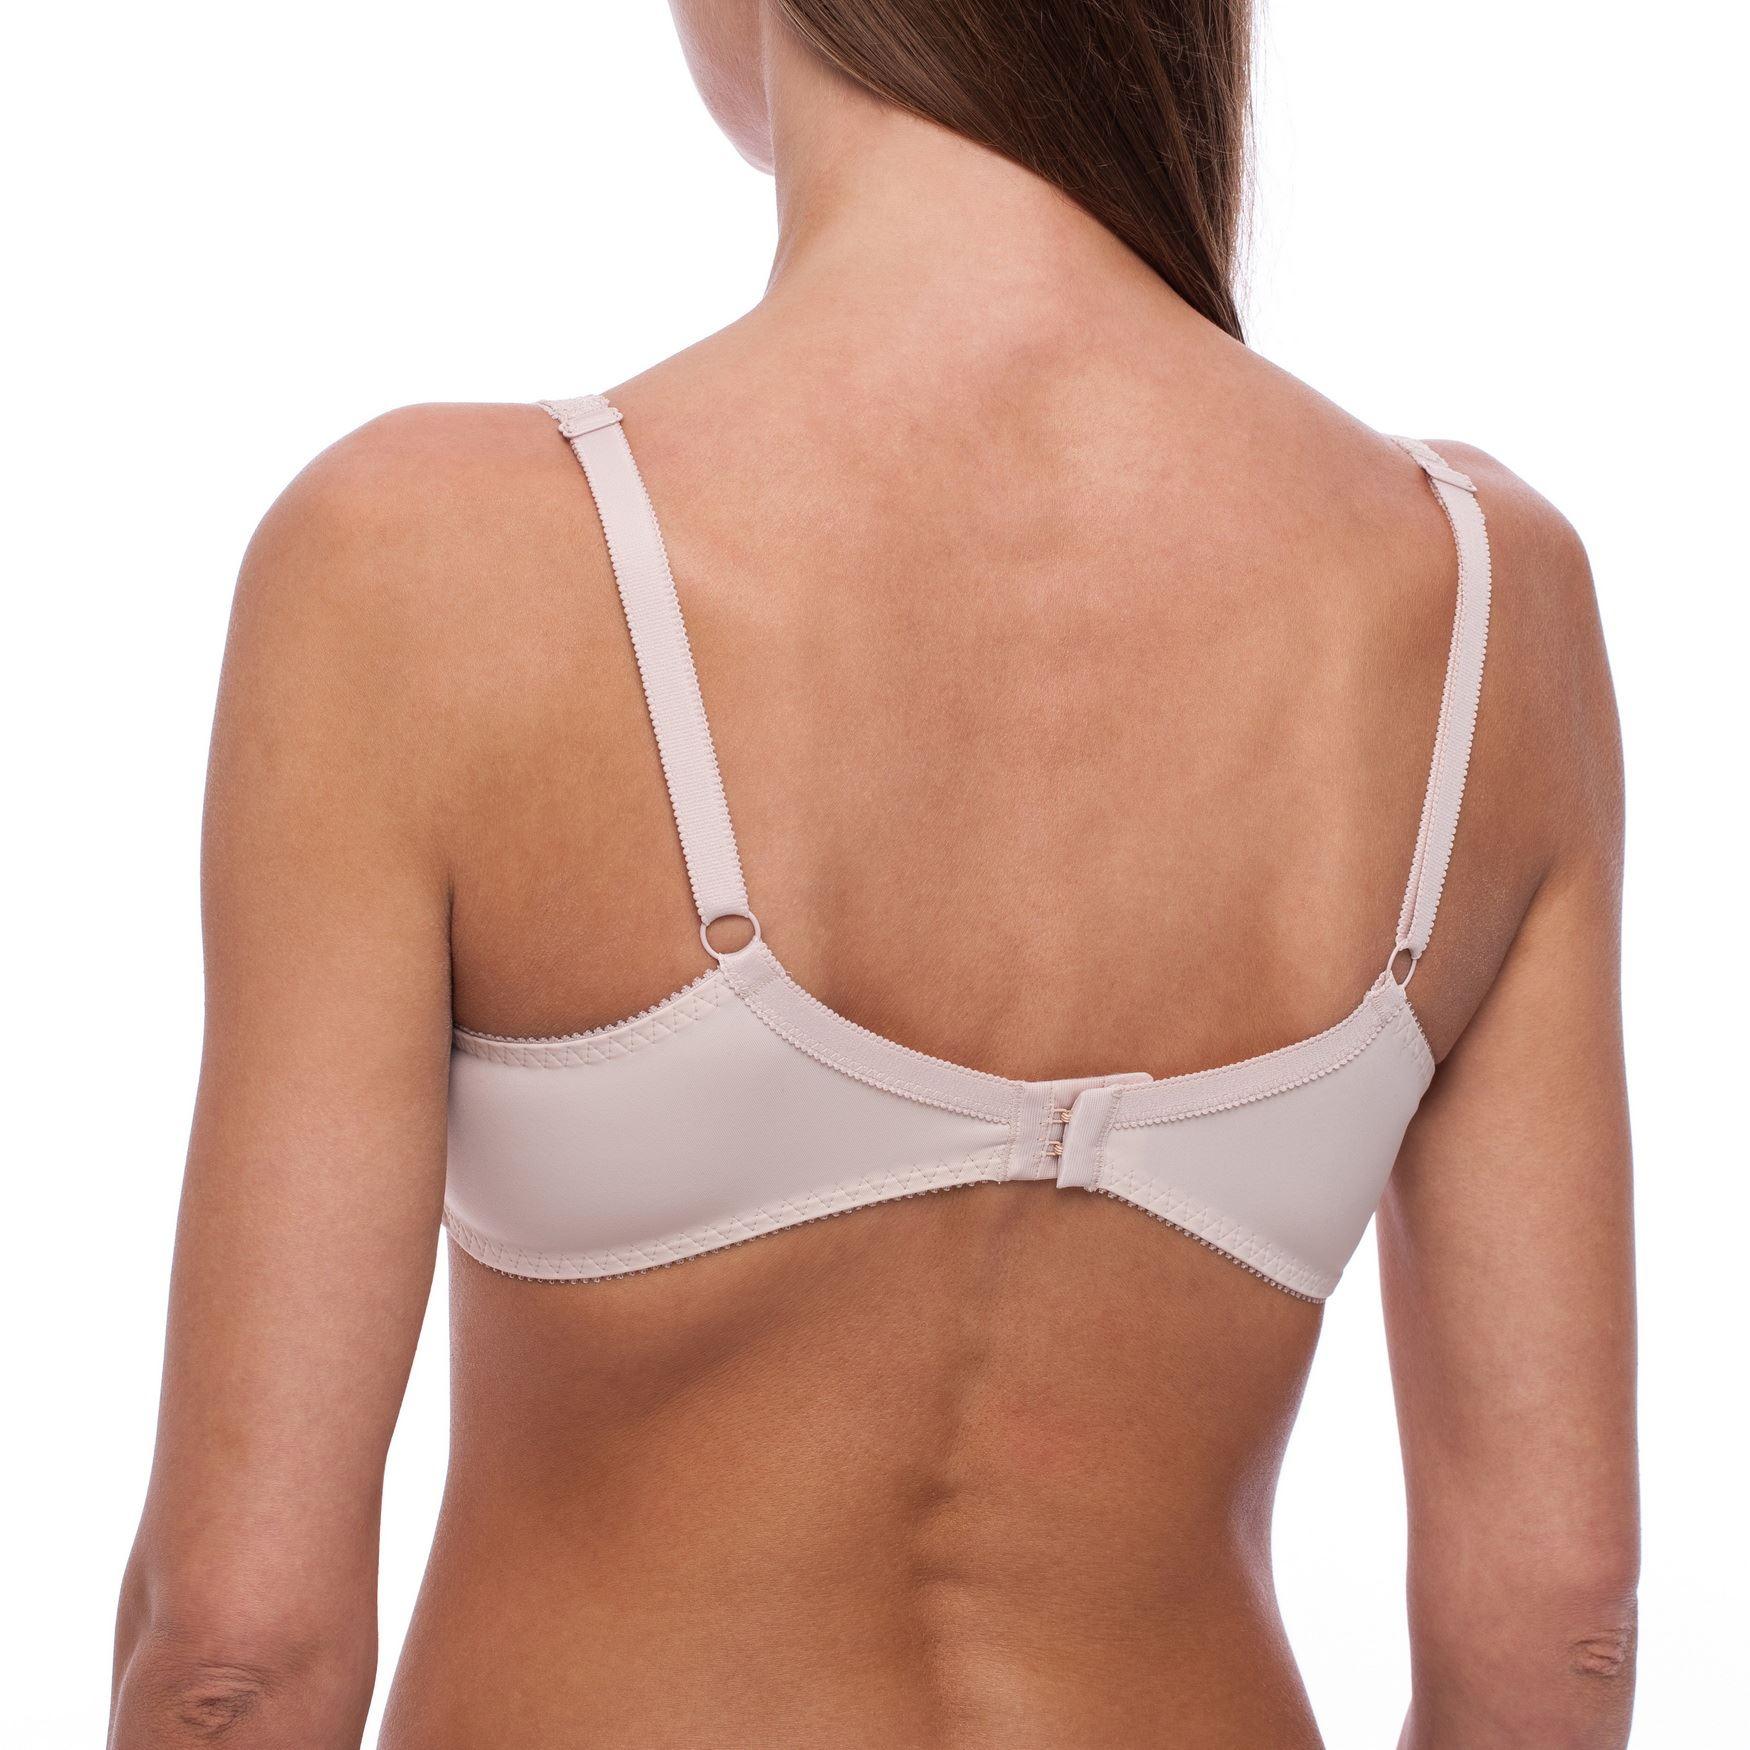 Minimizer-Plus-Size-Sheer-Lace-Unlined-Comfort-Full-Coverage-Sleep-Figure-Bra thumbnail 4